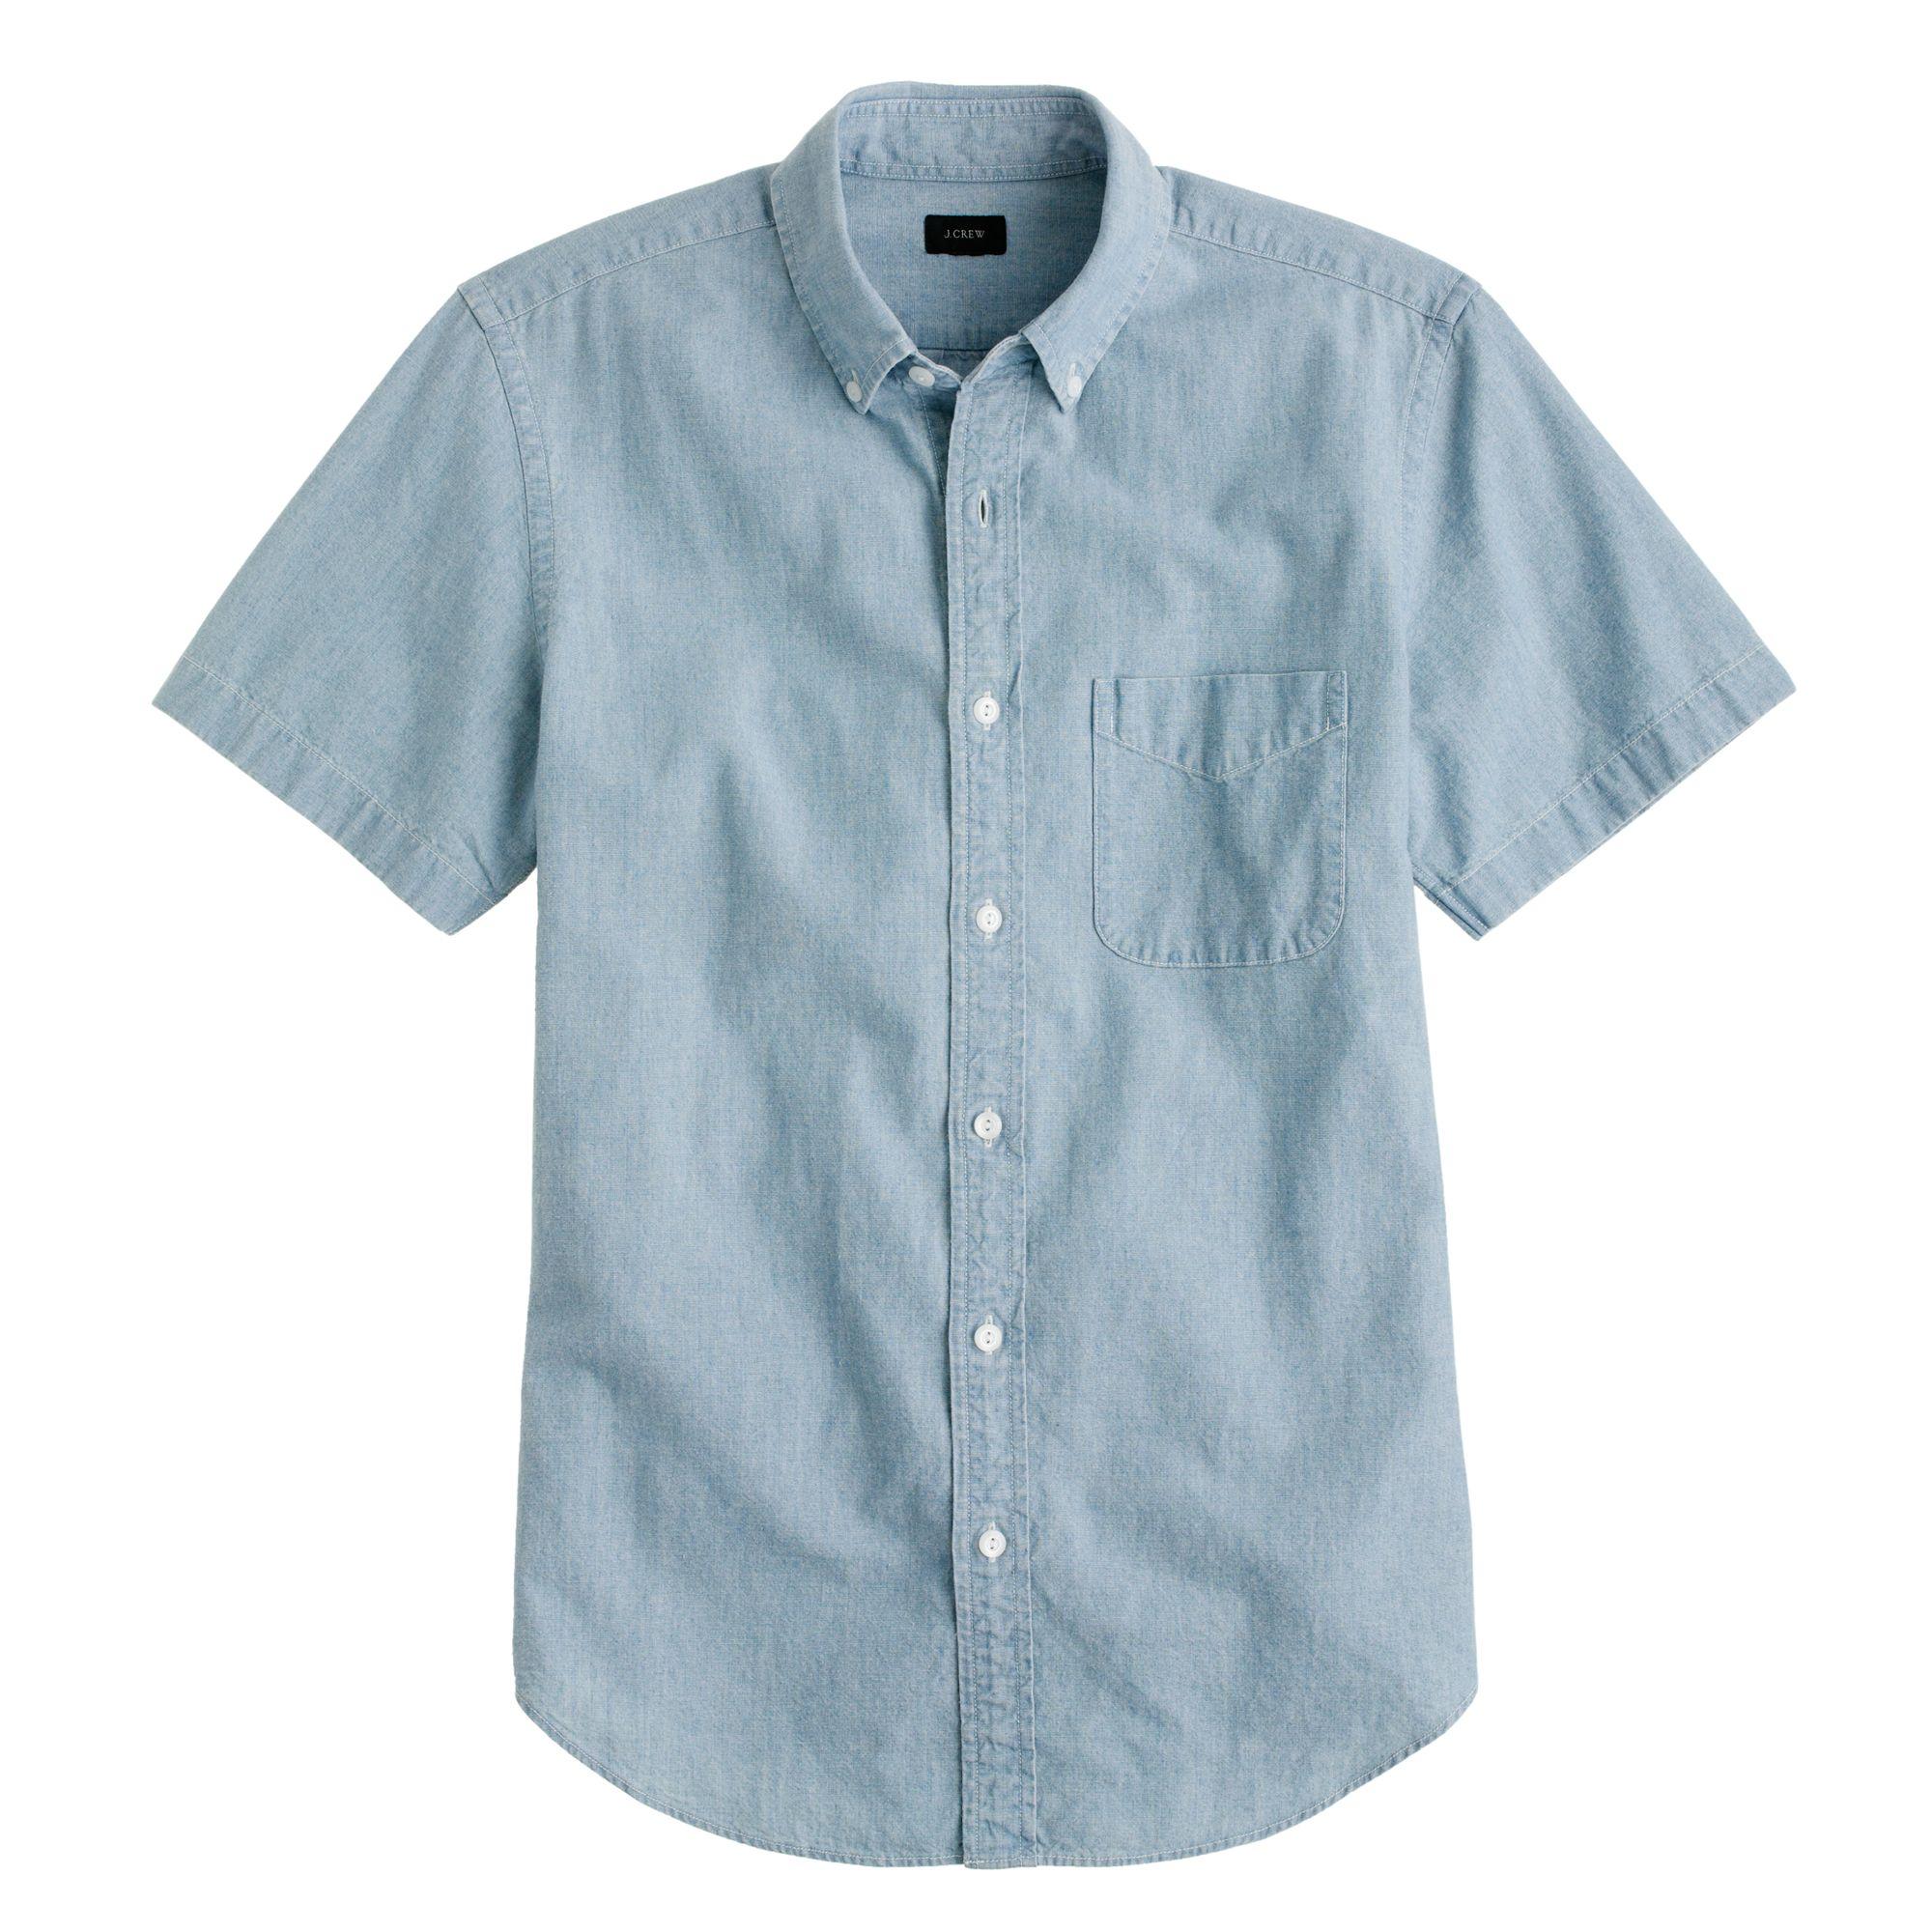 Tall Short Sleeve Shirt In Japanese Indigo Chambray